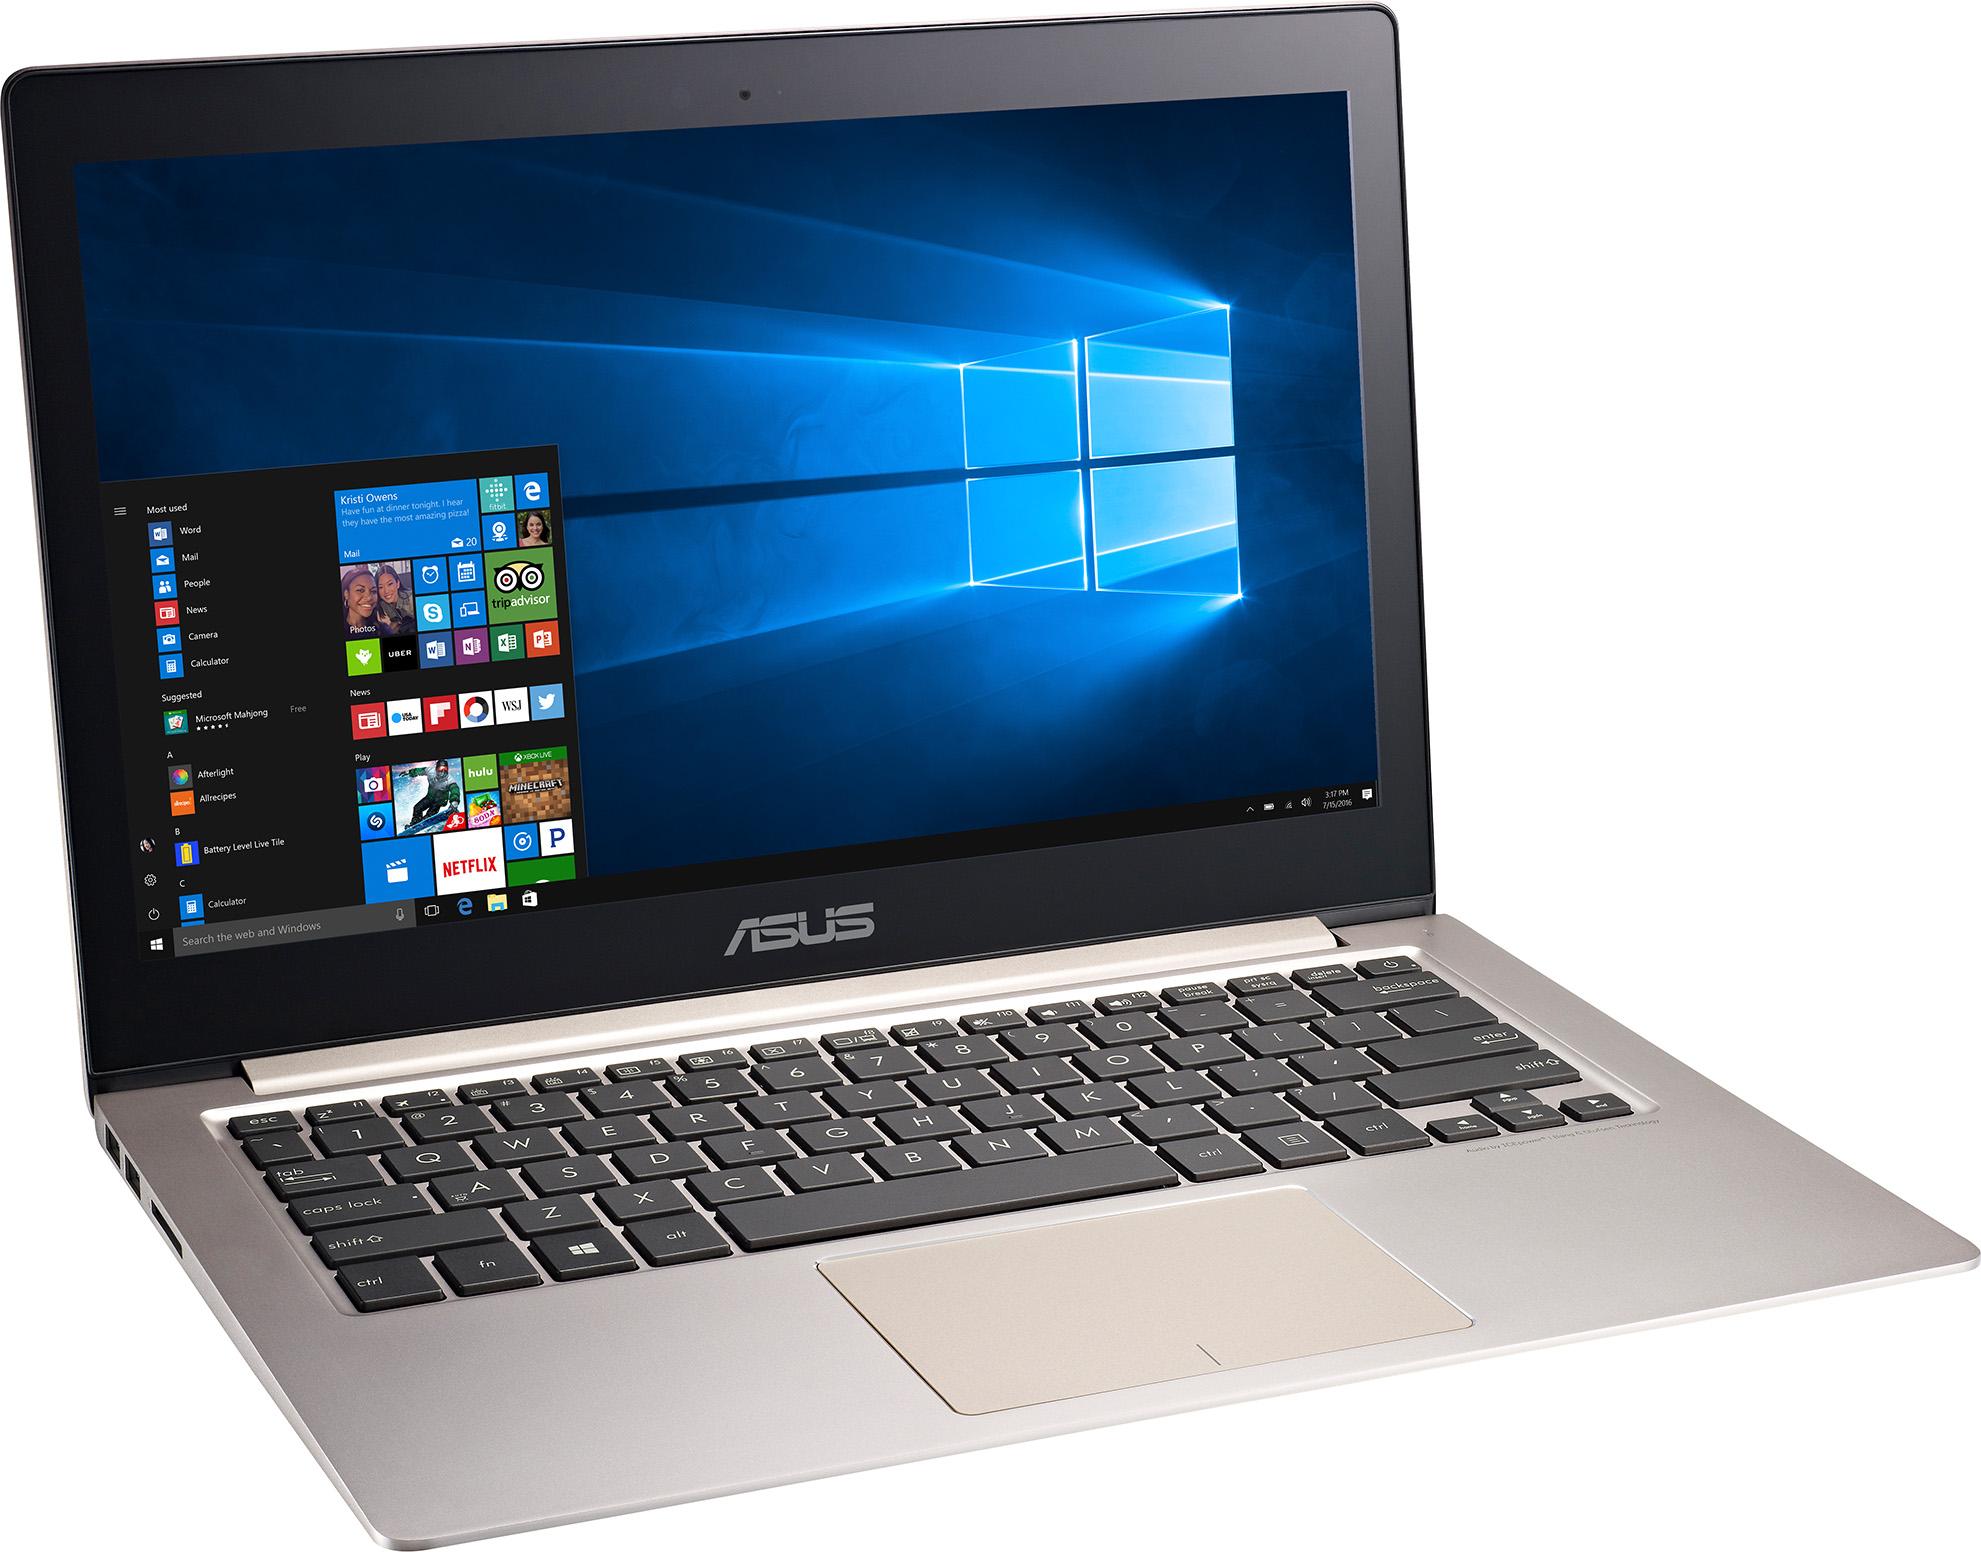 ASUS ZenBook UX303UB-UH74T Signature Edition Laptop